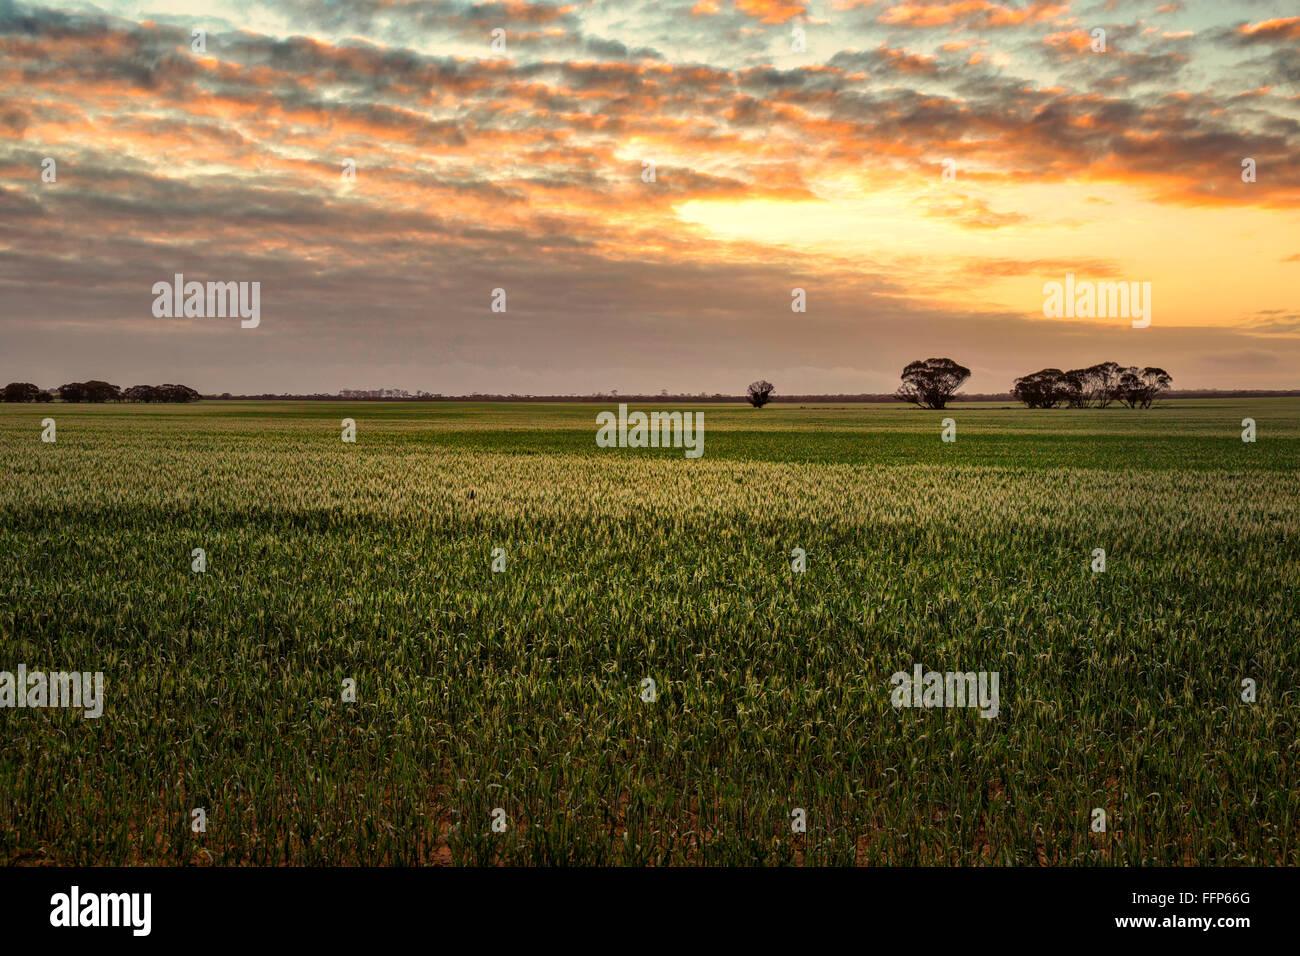 Dawn across a field of wheat, Western Australia - Stock Image